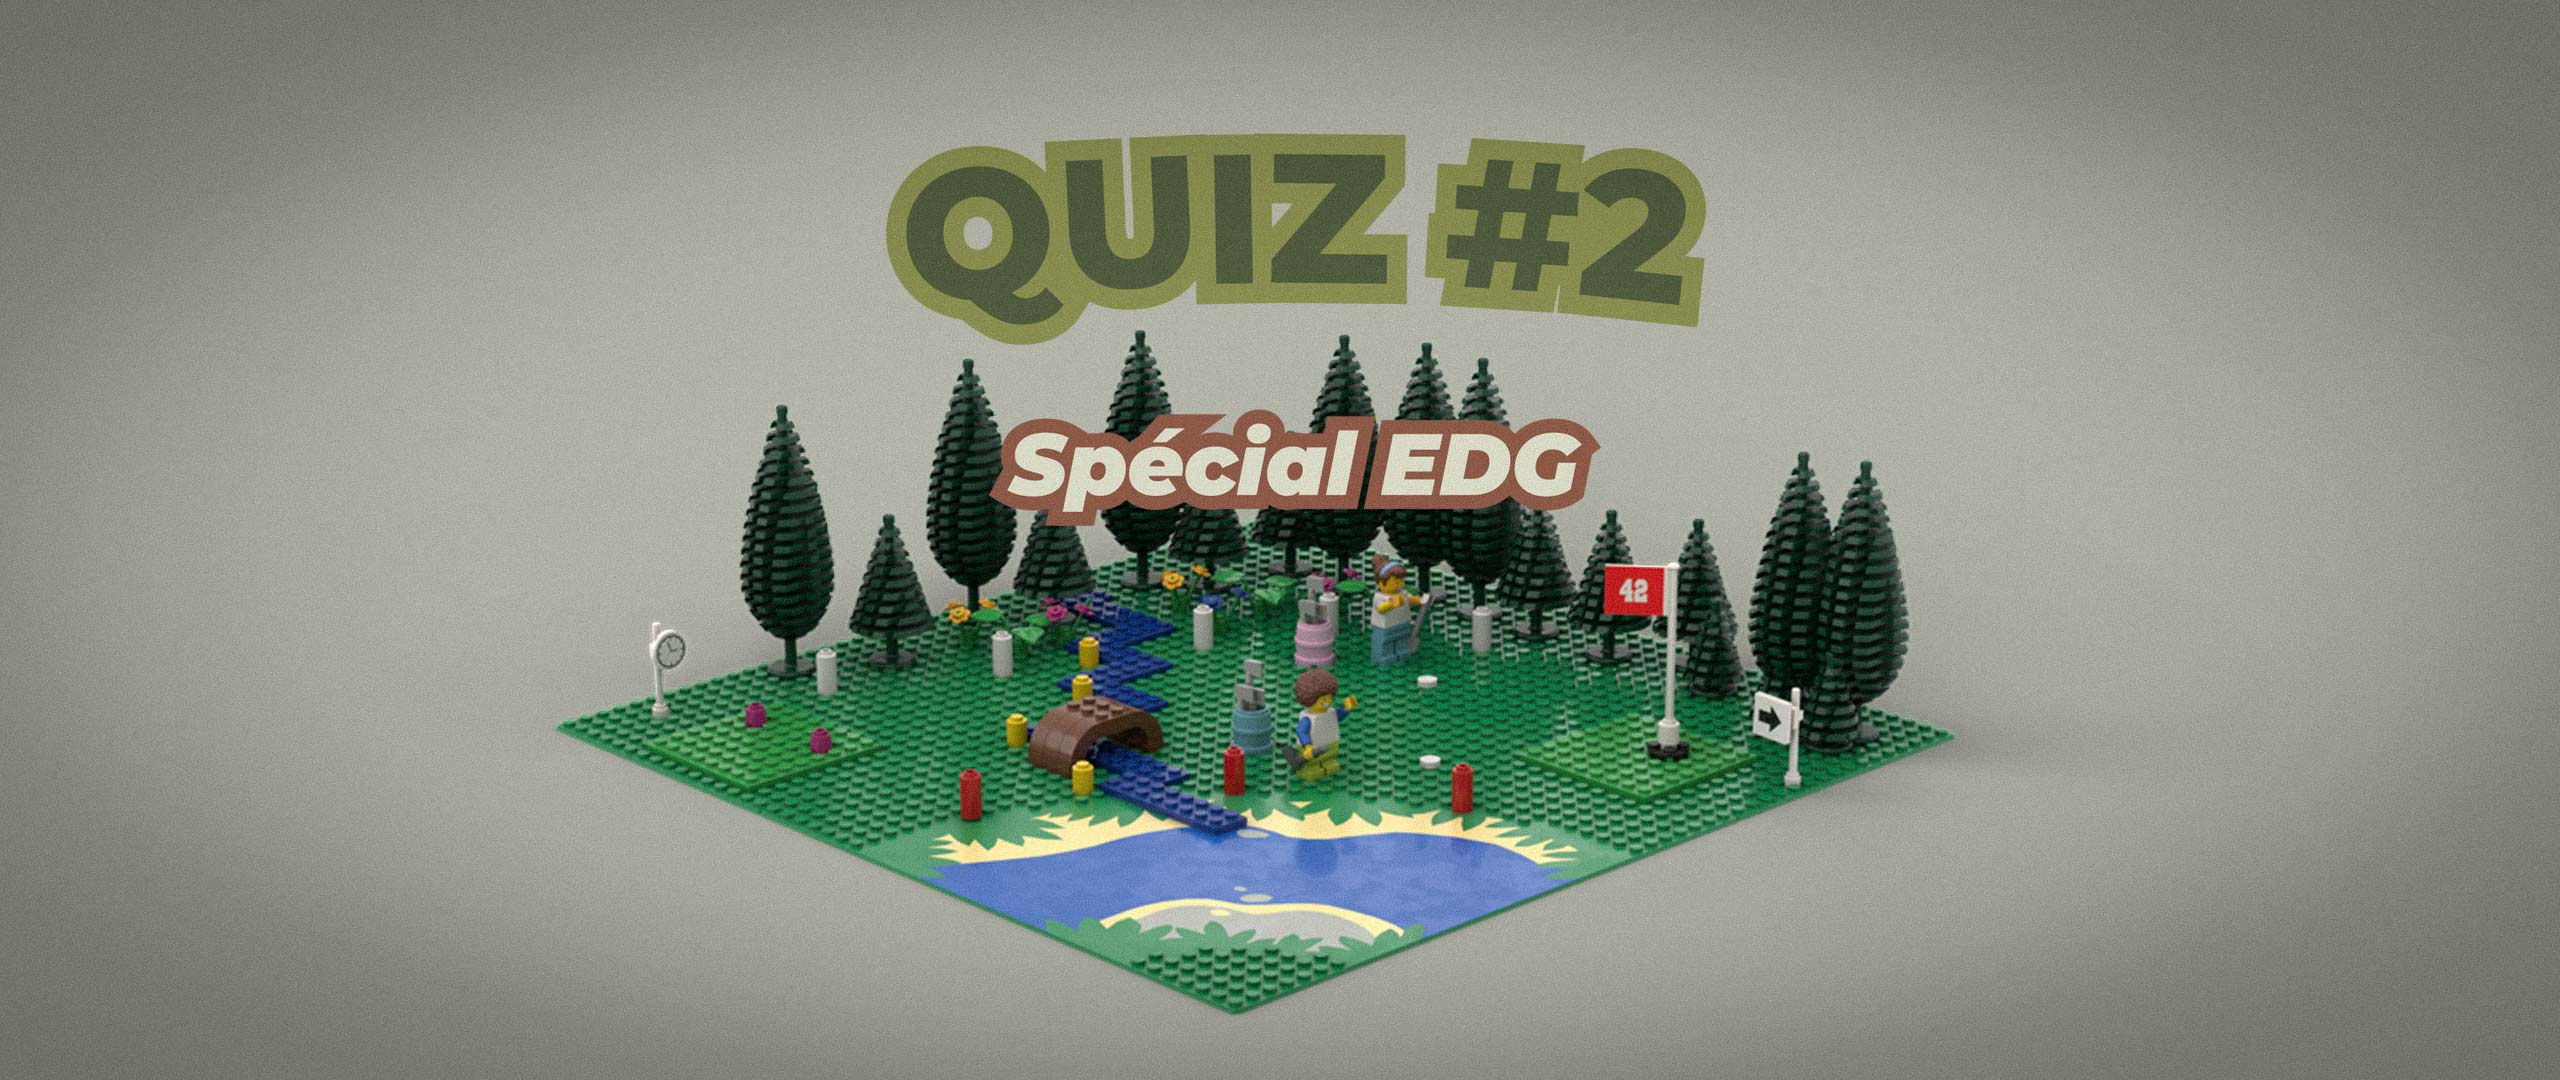 Golf O Quizz Edg 2021 Quiz 2 Header